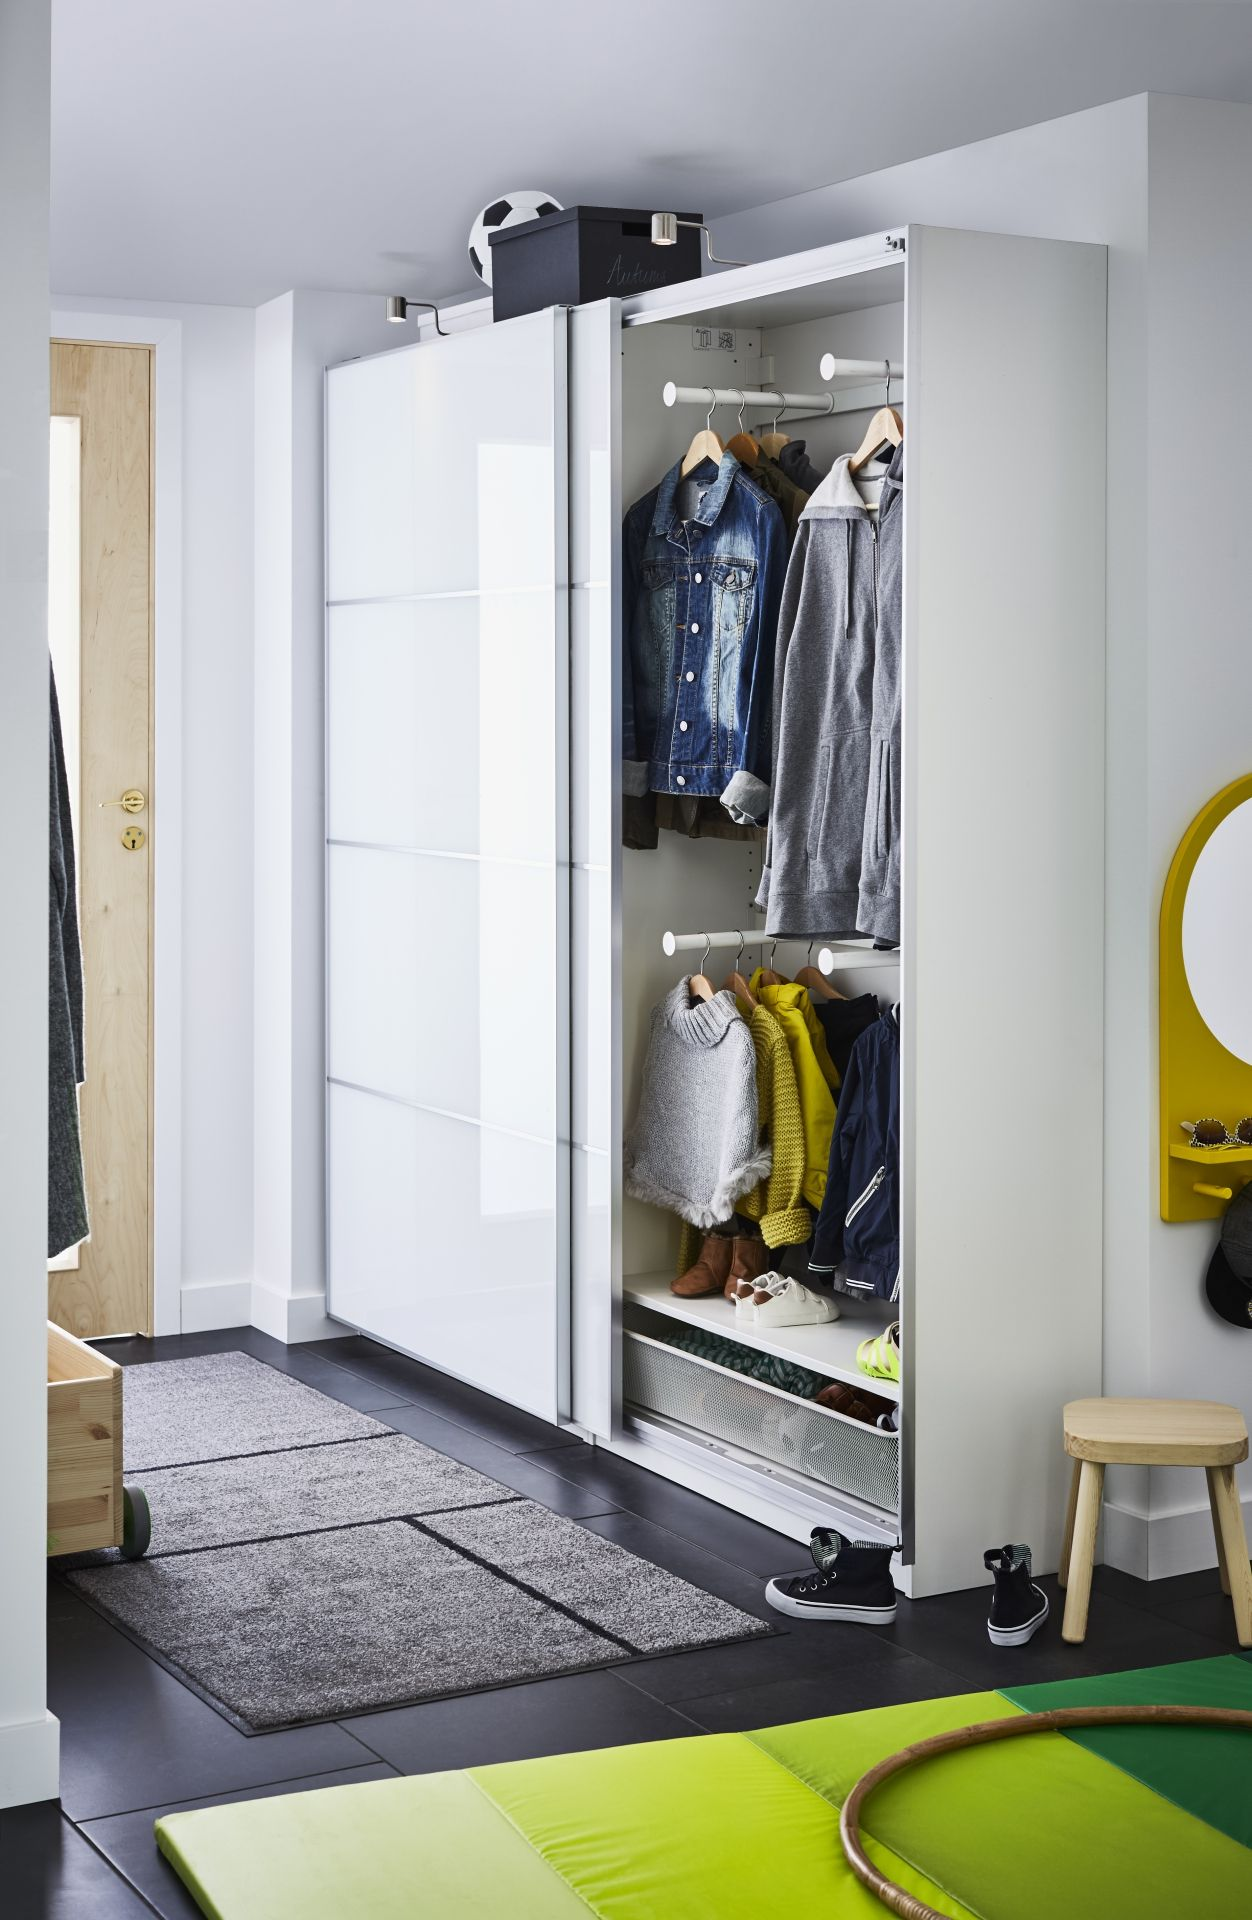 Pax Birkeland Garderobekast.Pax Garderobekast Ikea Ikeanederland Wooninspiratie Inspiratie